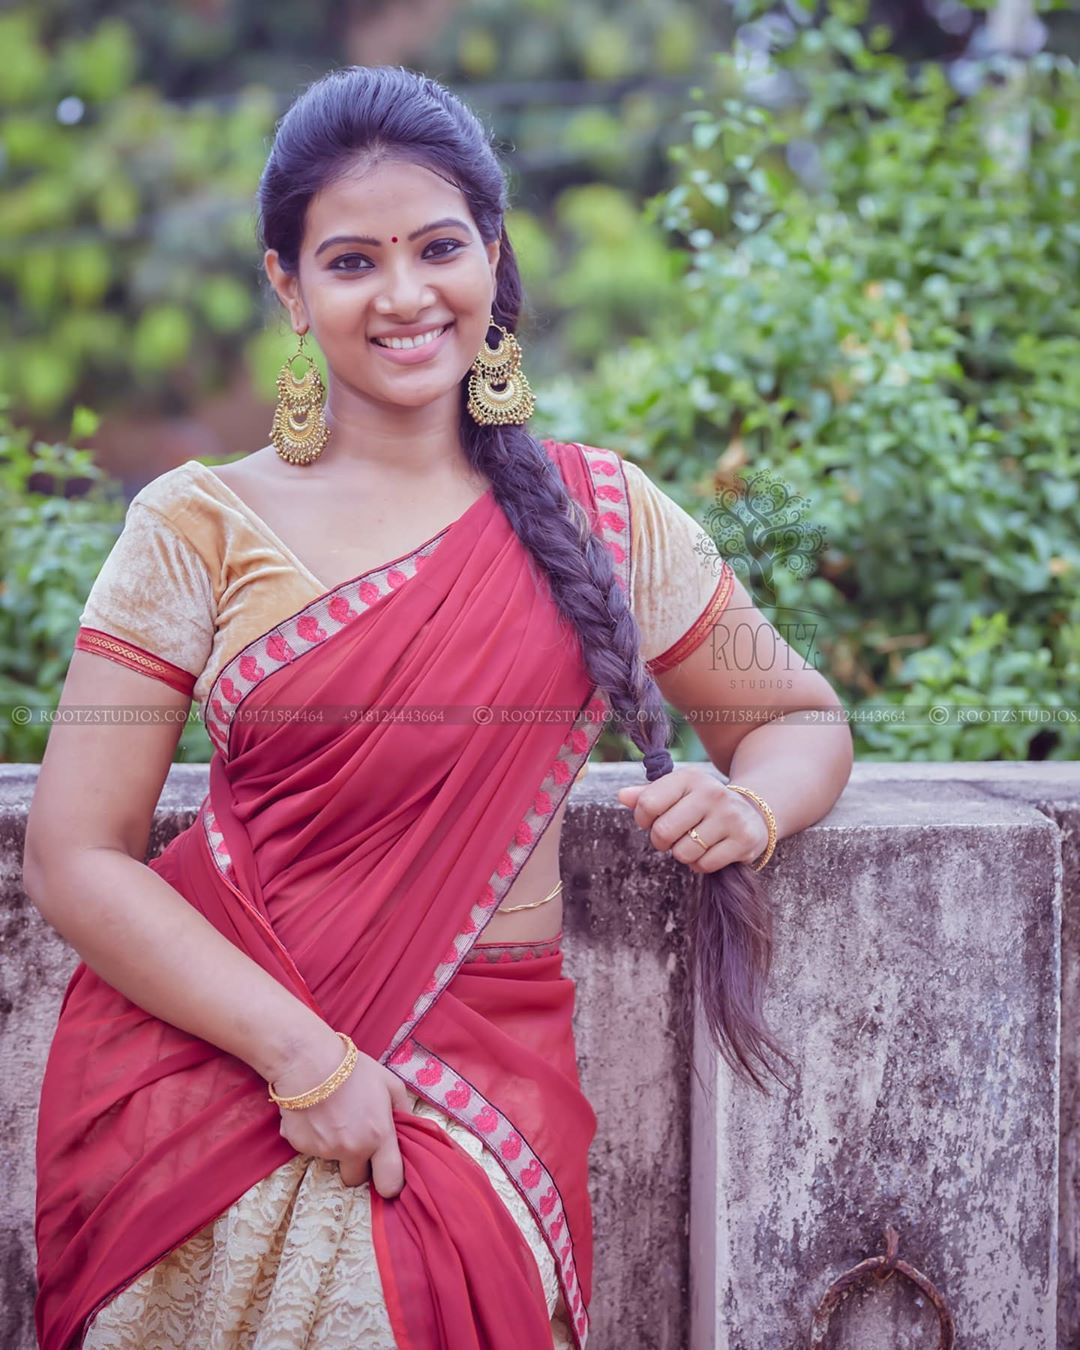 dhivya dhuraisamy homely saree photos (16)